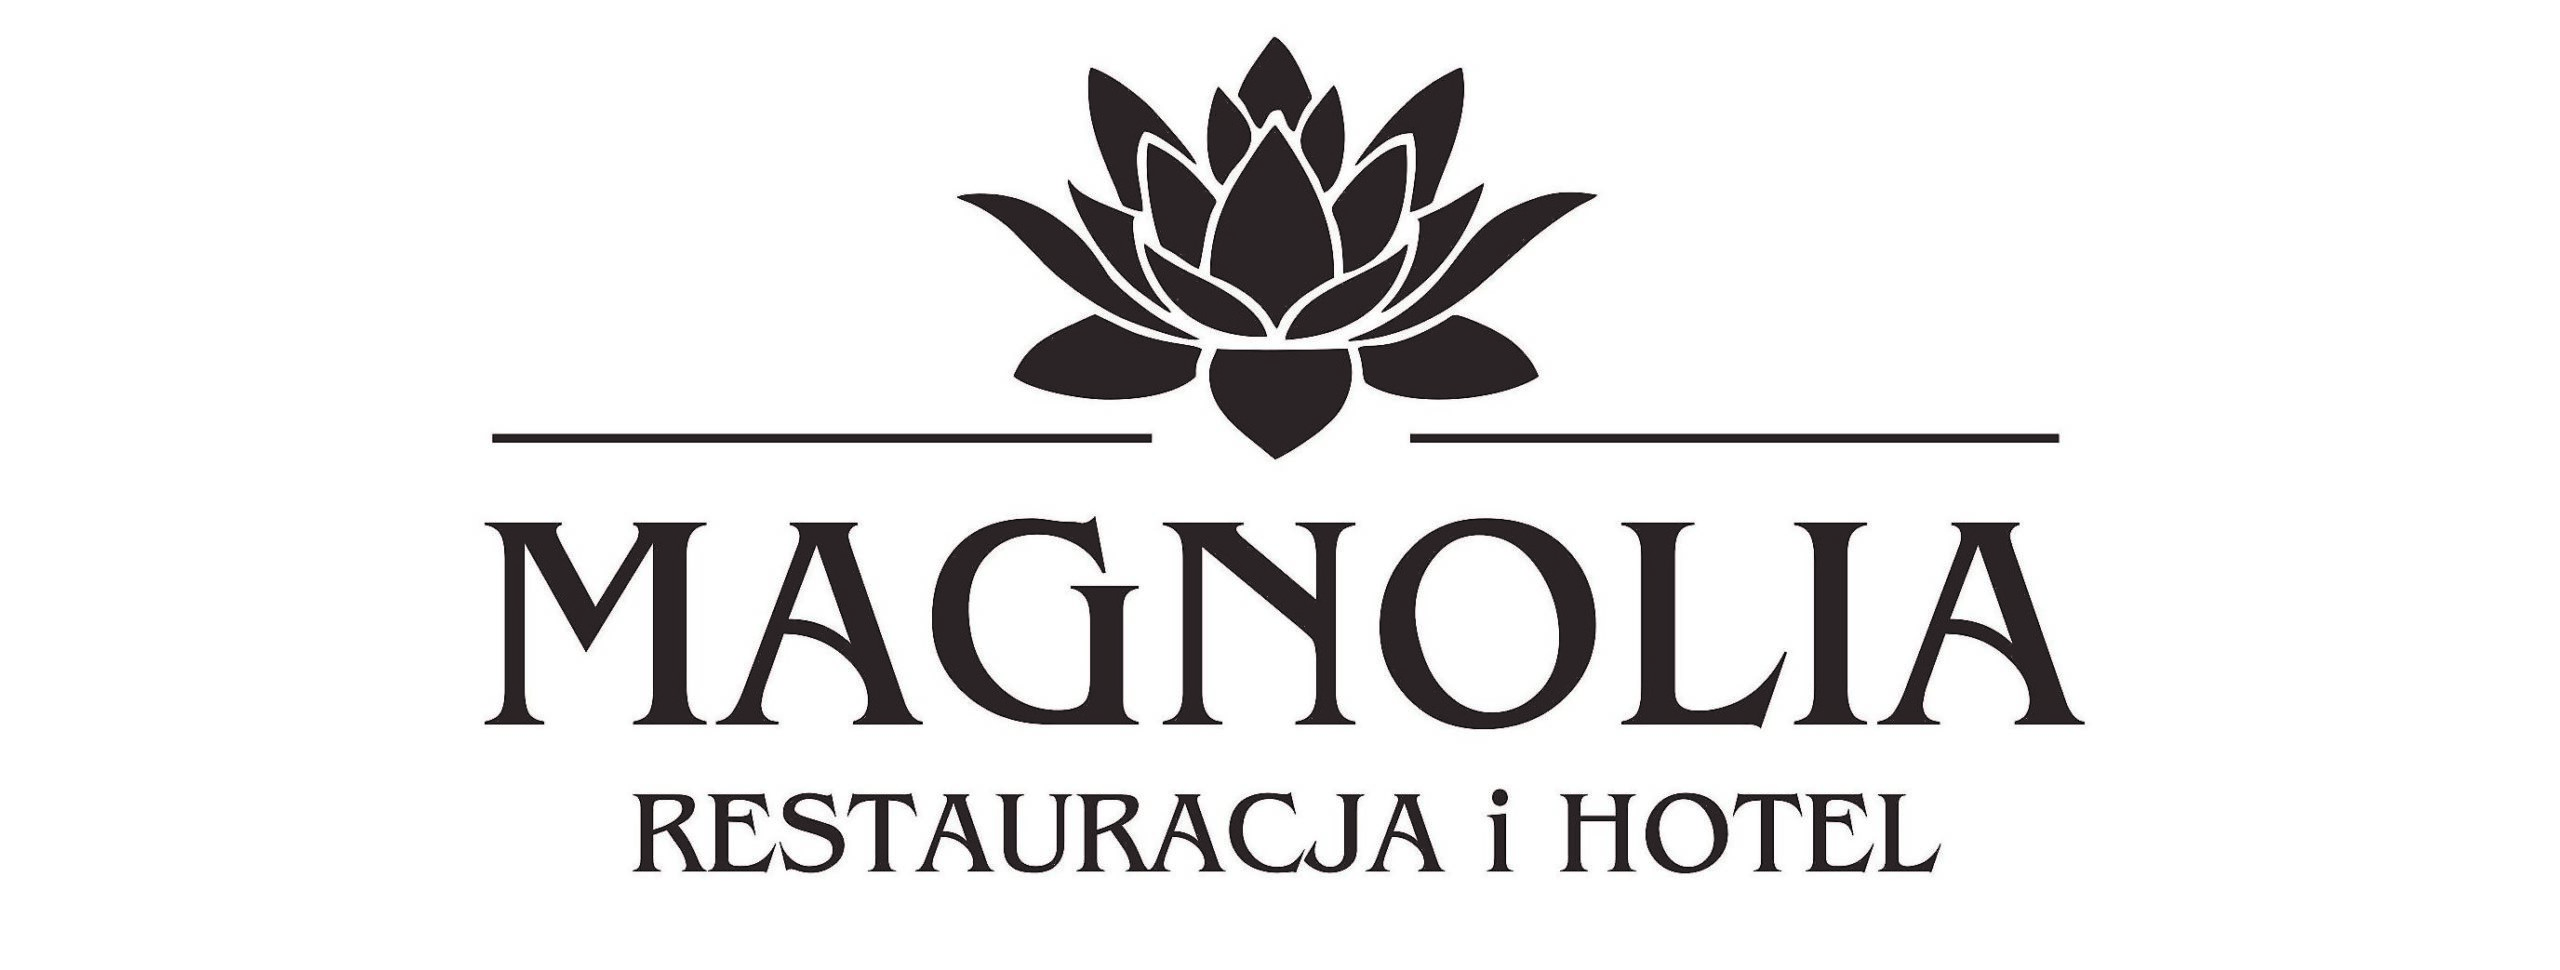 "Restauracja i Hotel ""Magnolia"""